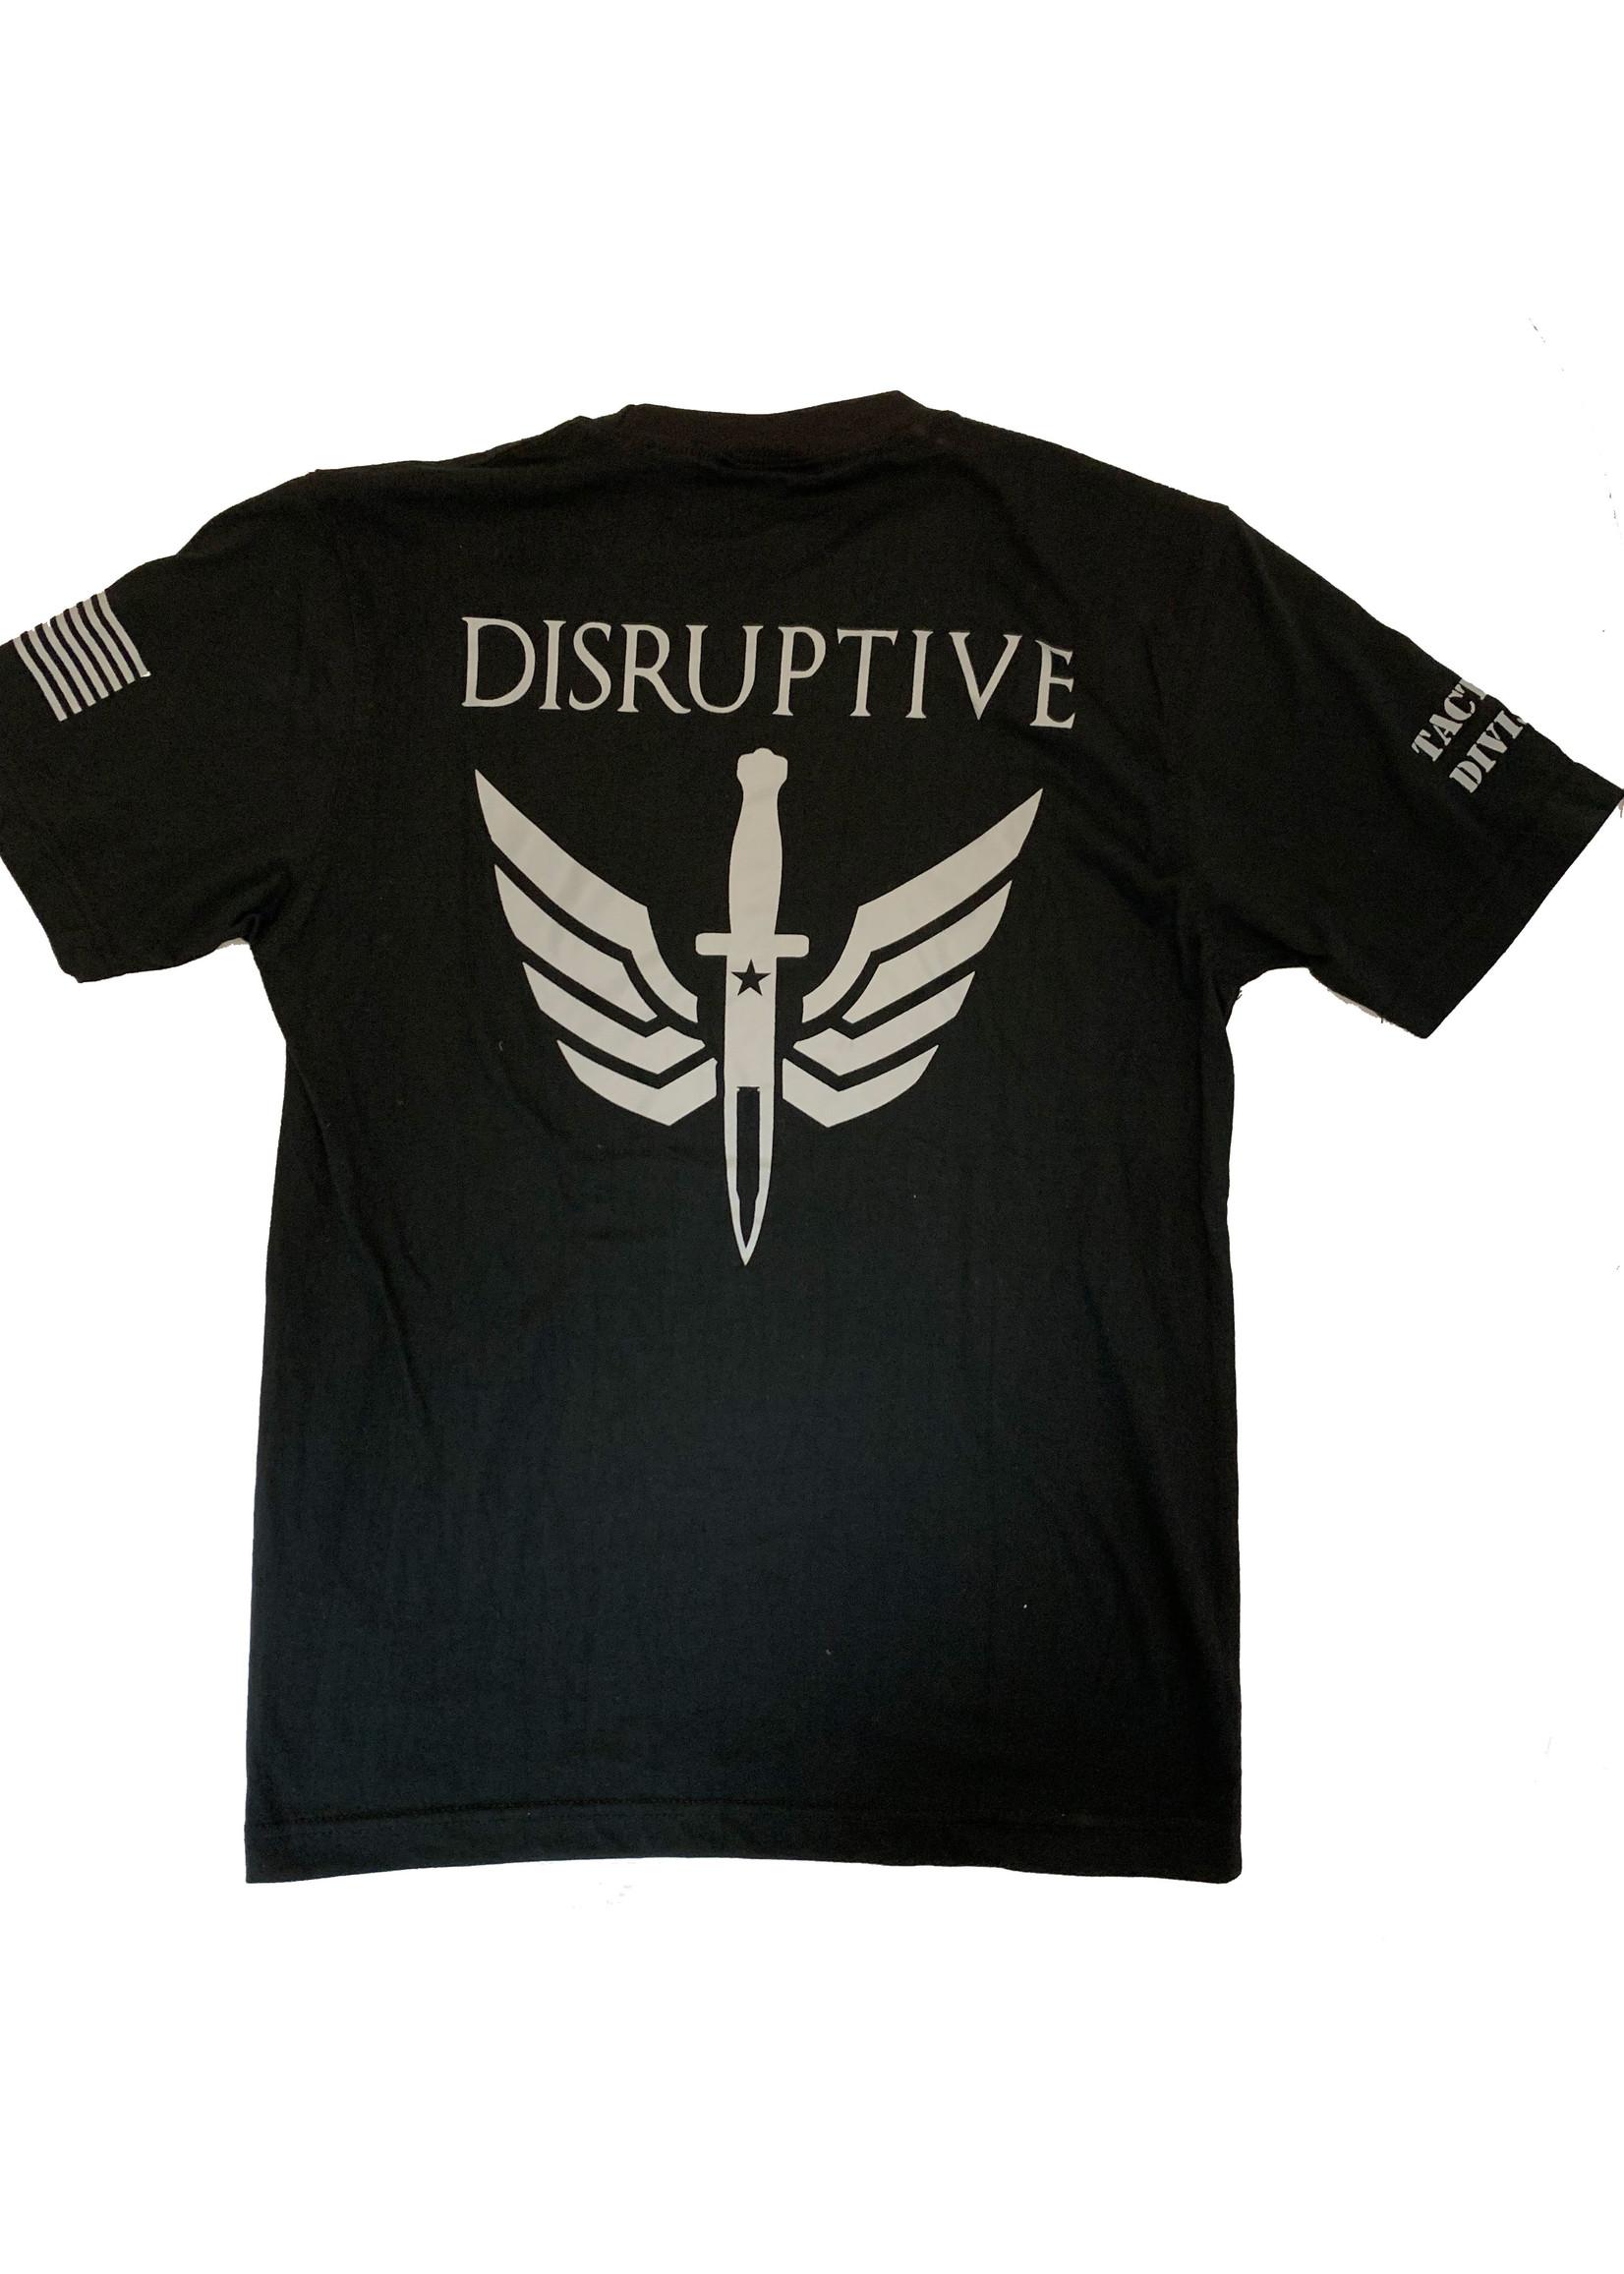 Disruptive Products DISRUPTIVE TACTICAL T-SHIRT